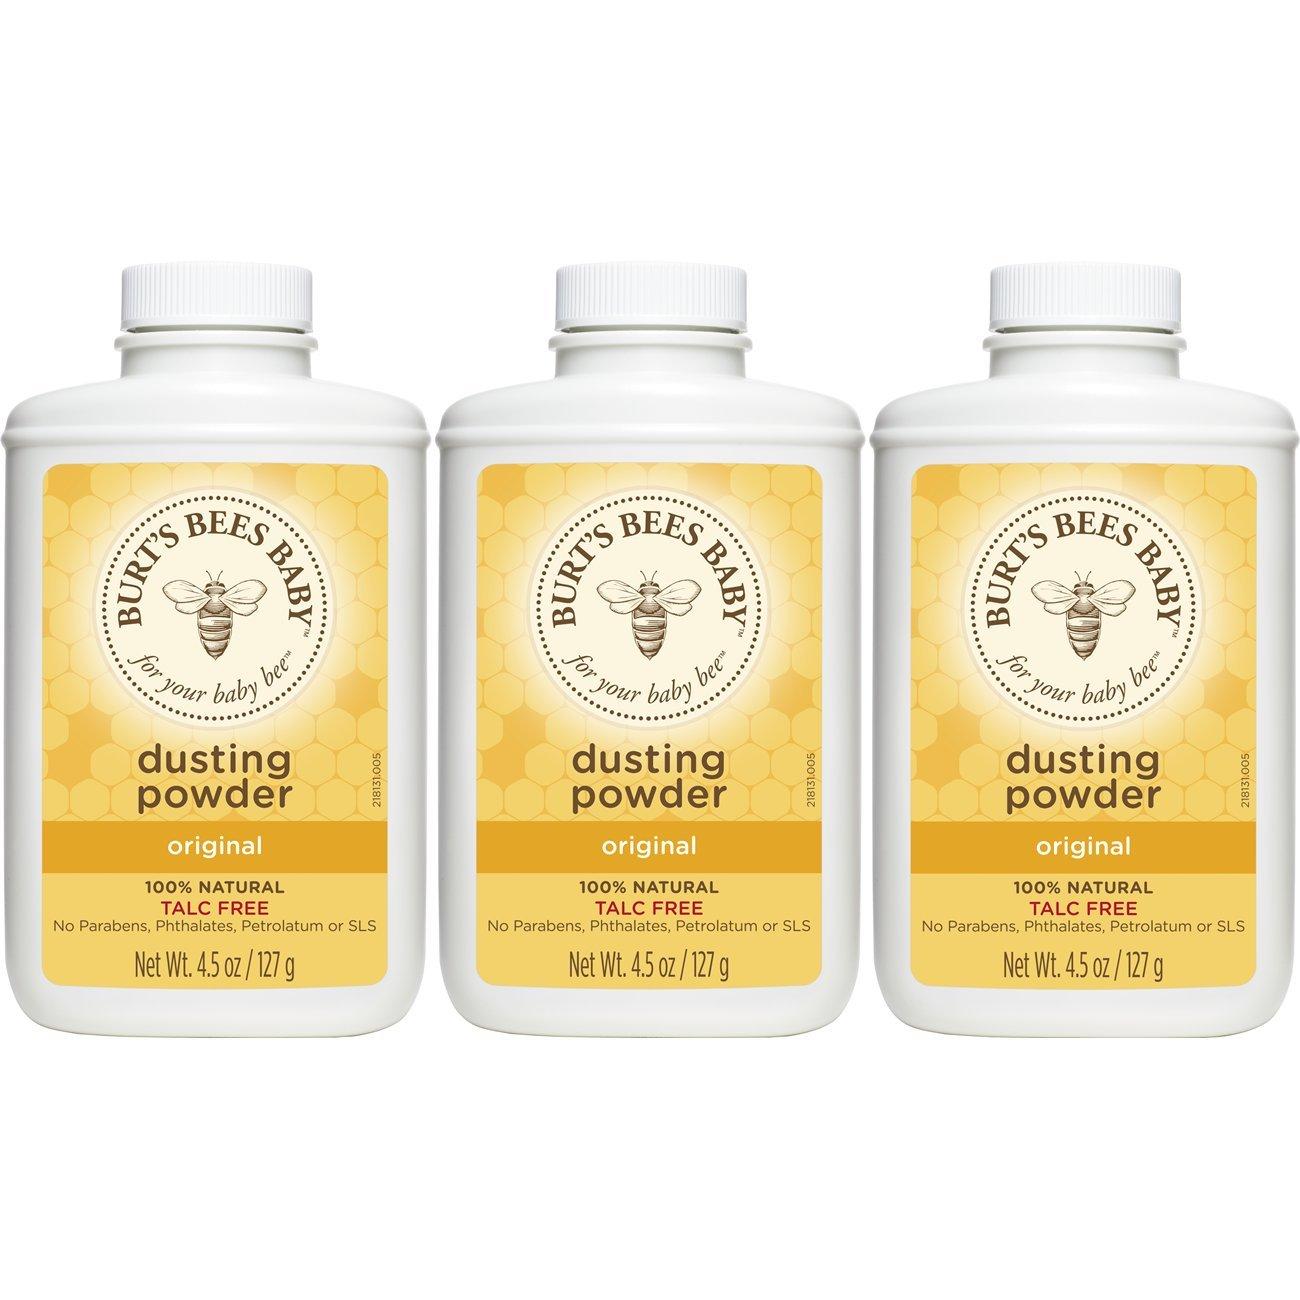 Burt's Bees: Baby Bee Dusting Powder, 4.5 oz Burt' s Bees 36599-10